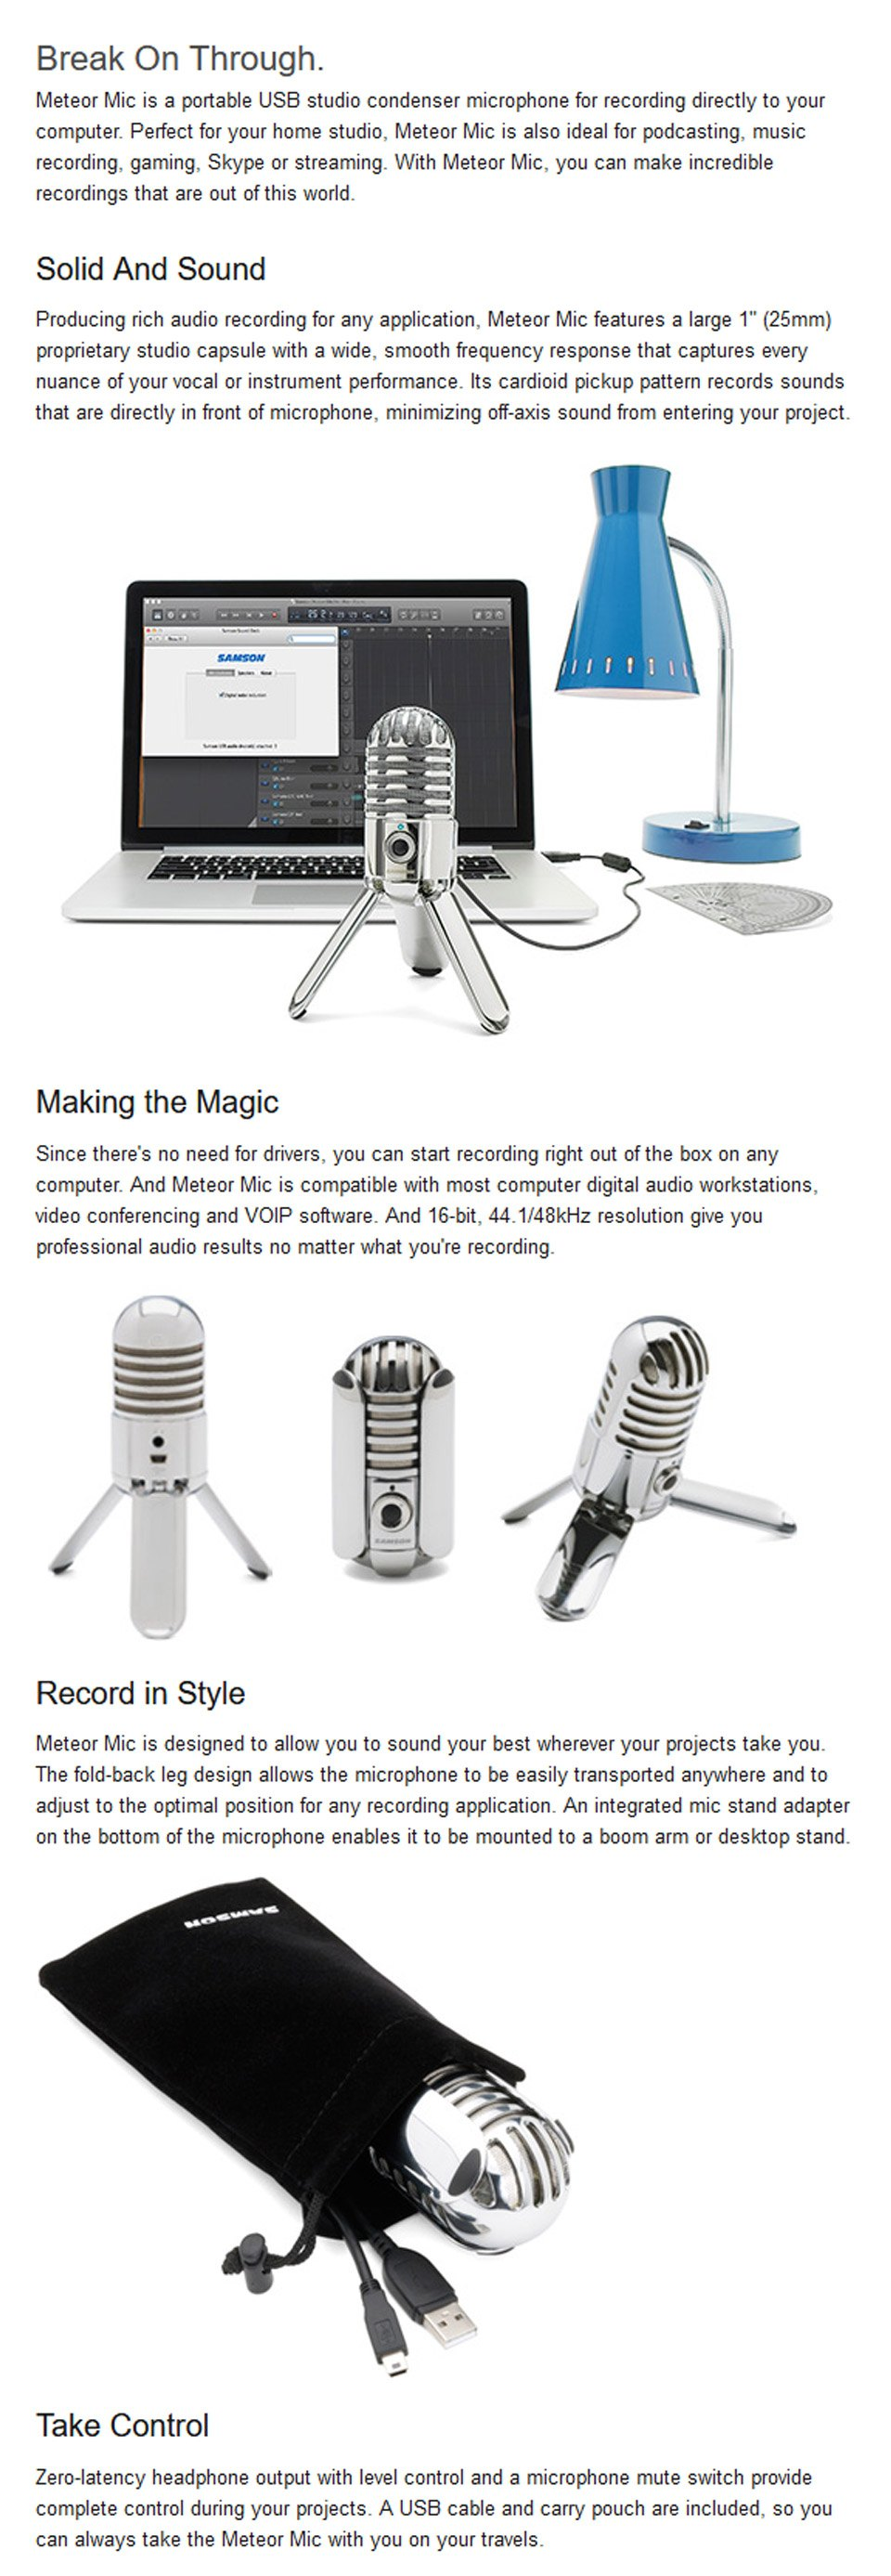 Samson Meteor USB Studio Condenser Microphone features